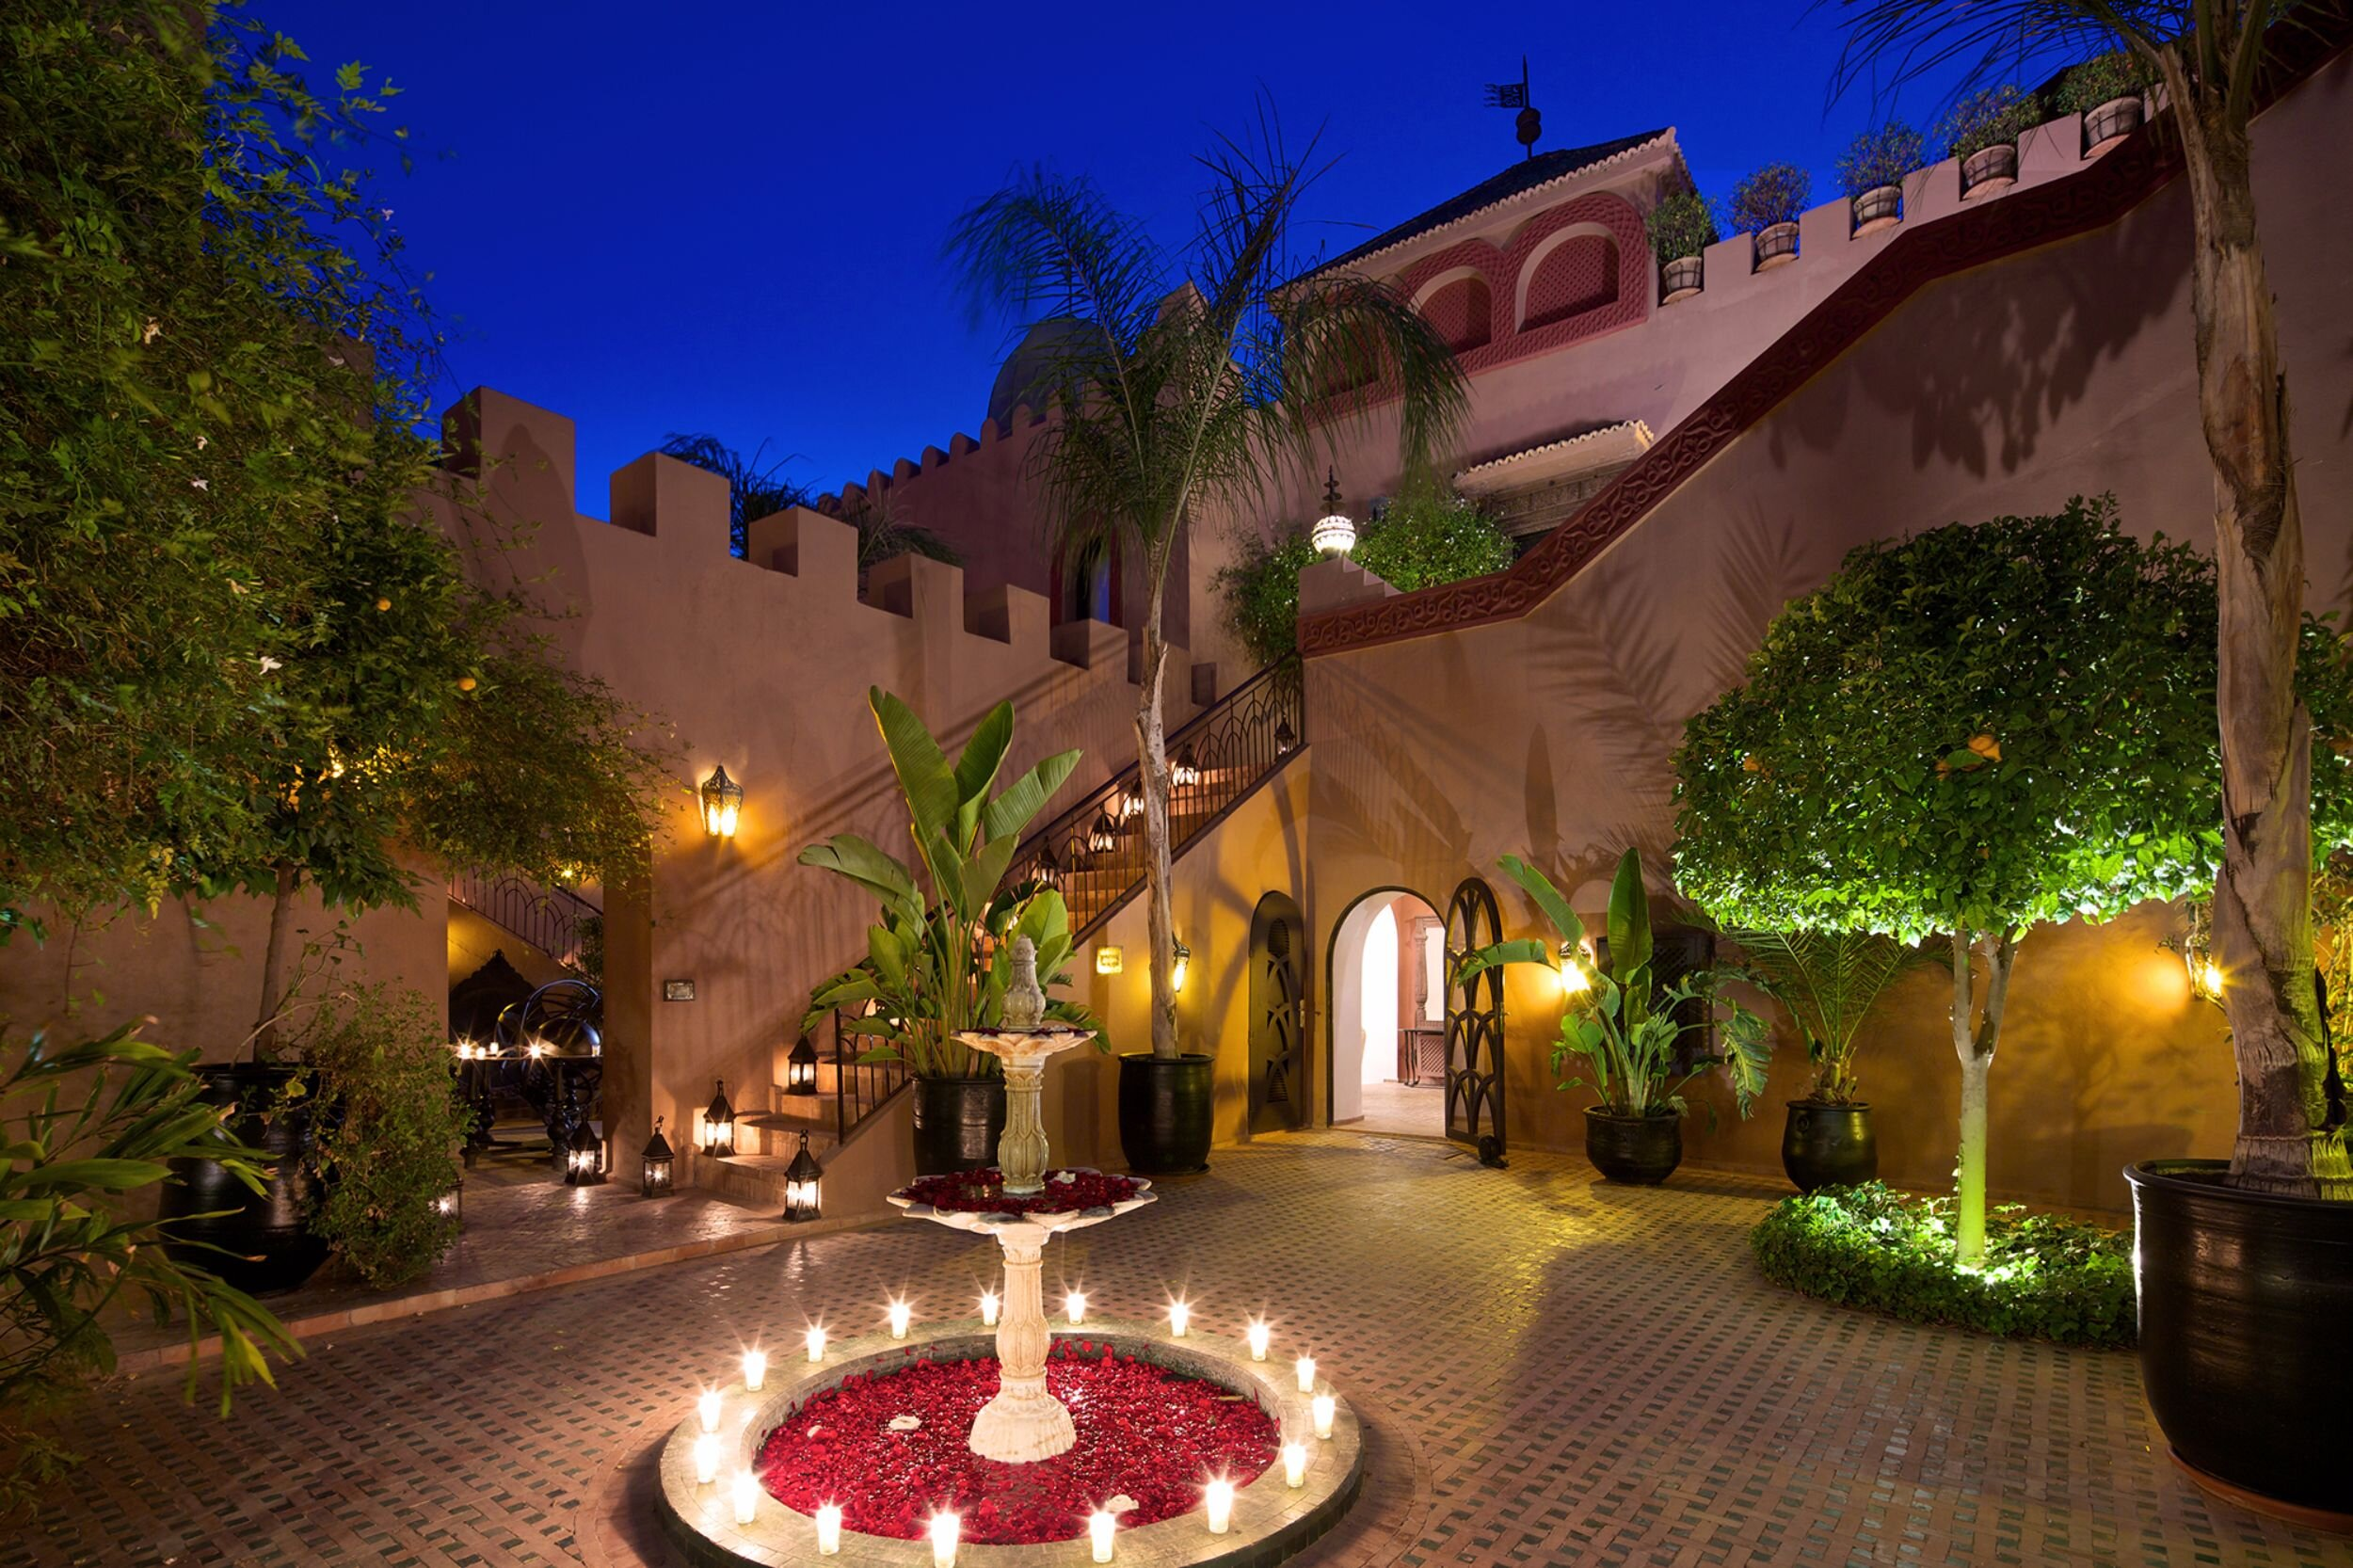 interior-courtyard-night.jpg